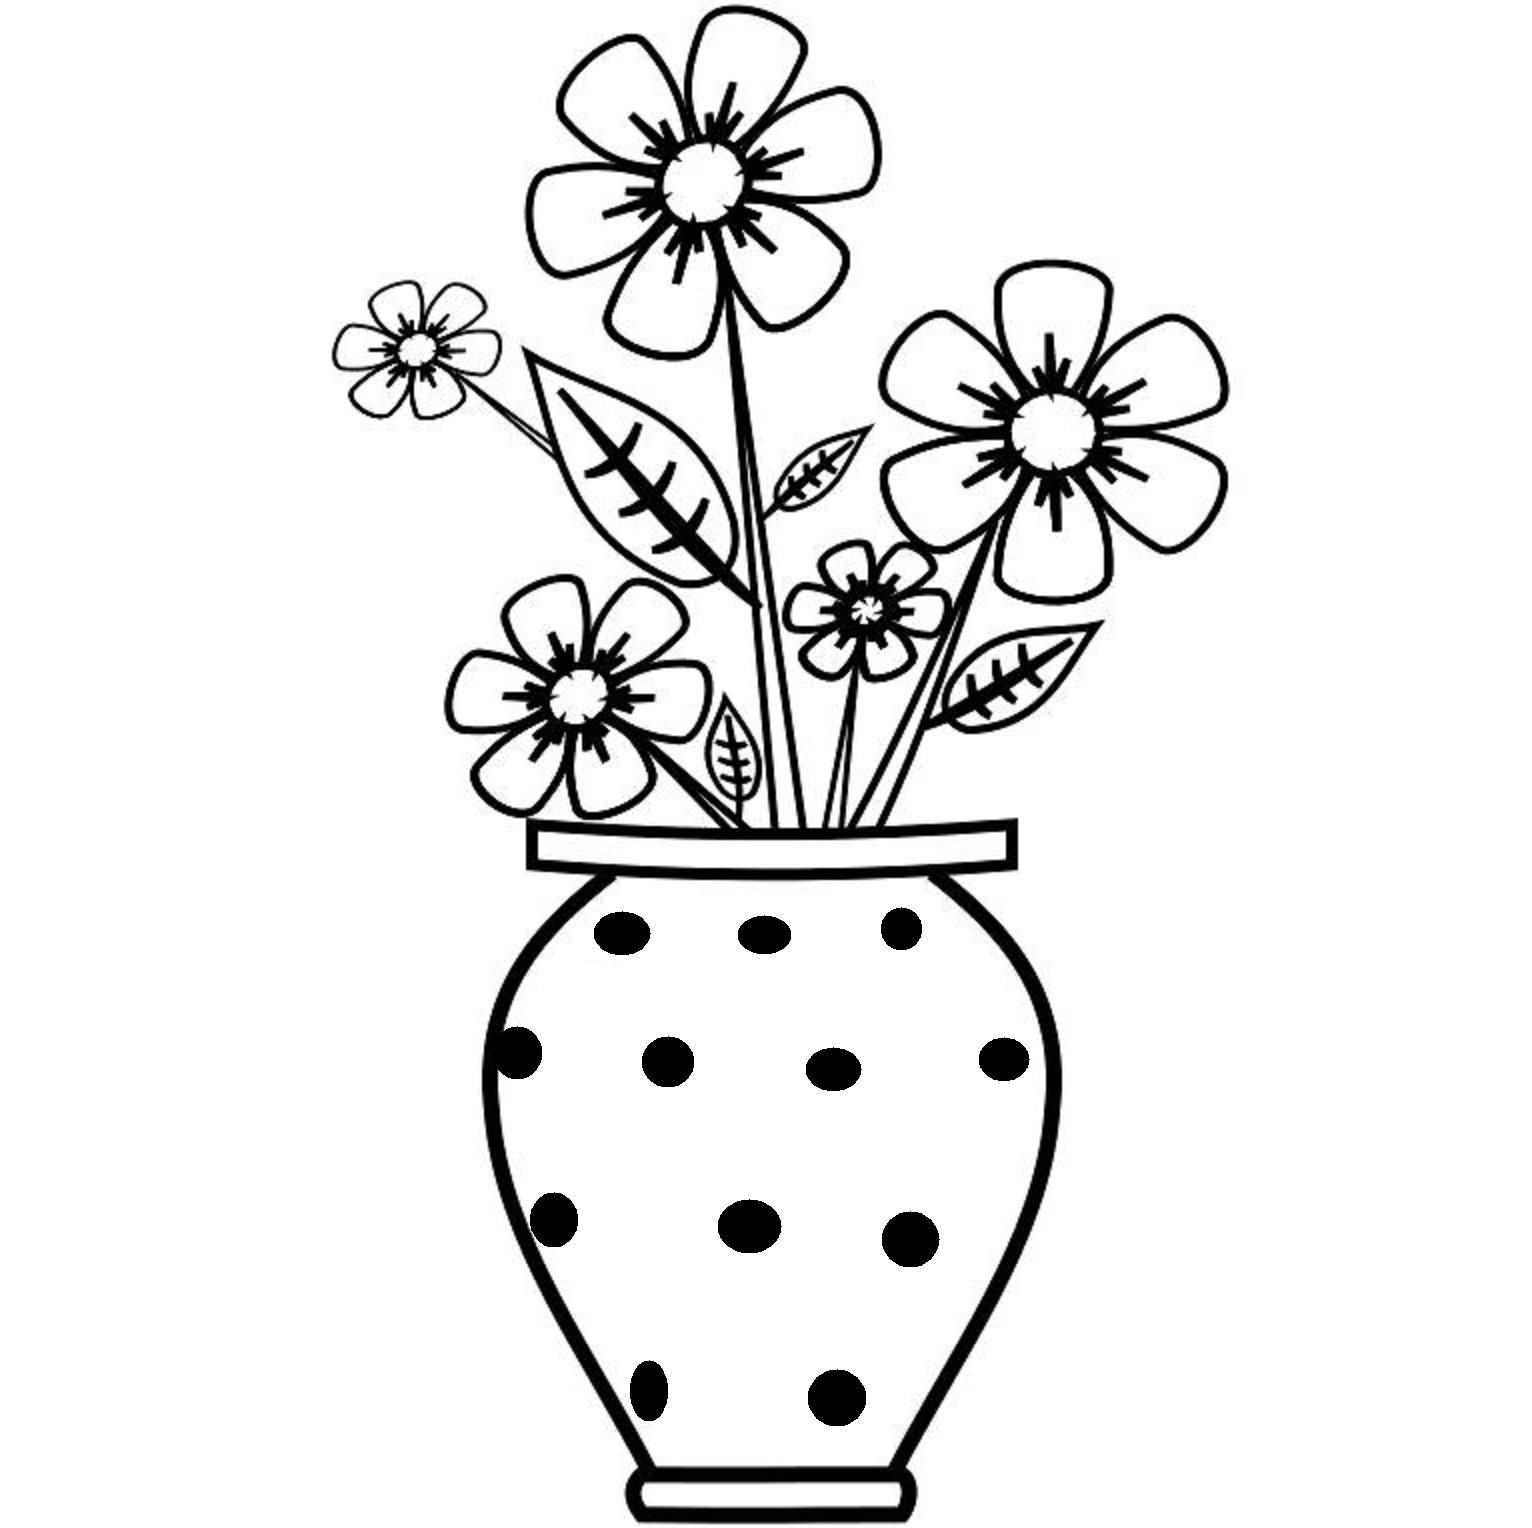 1532x1528 Line Drawing Of Vases Of Flowers Gallery Flower Vase Drawing